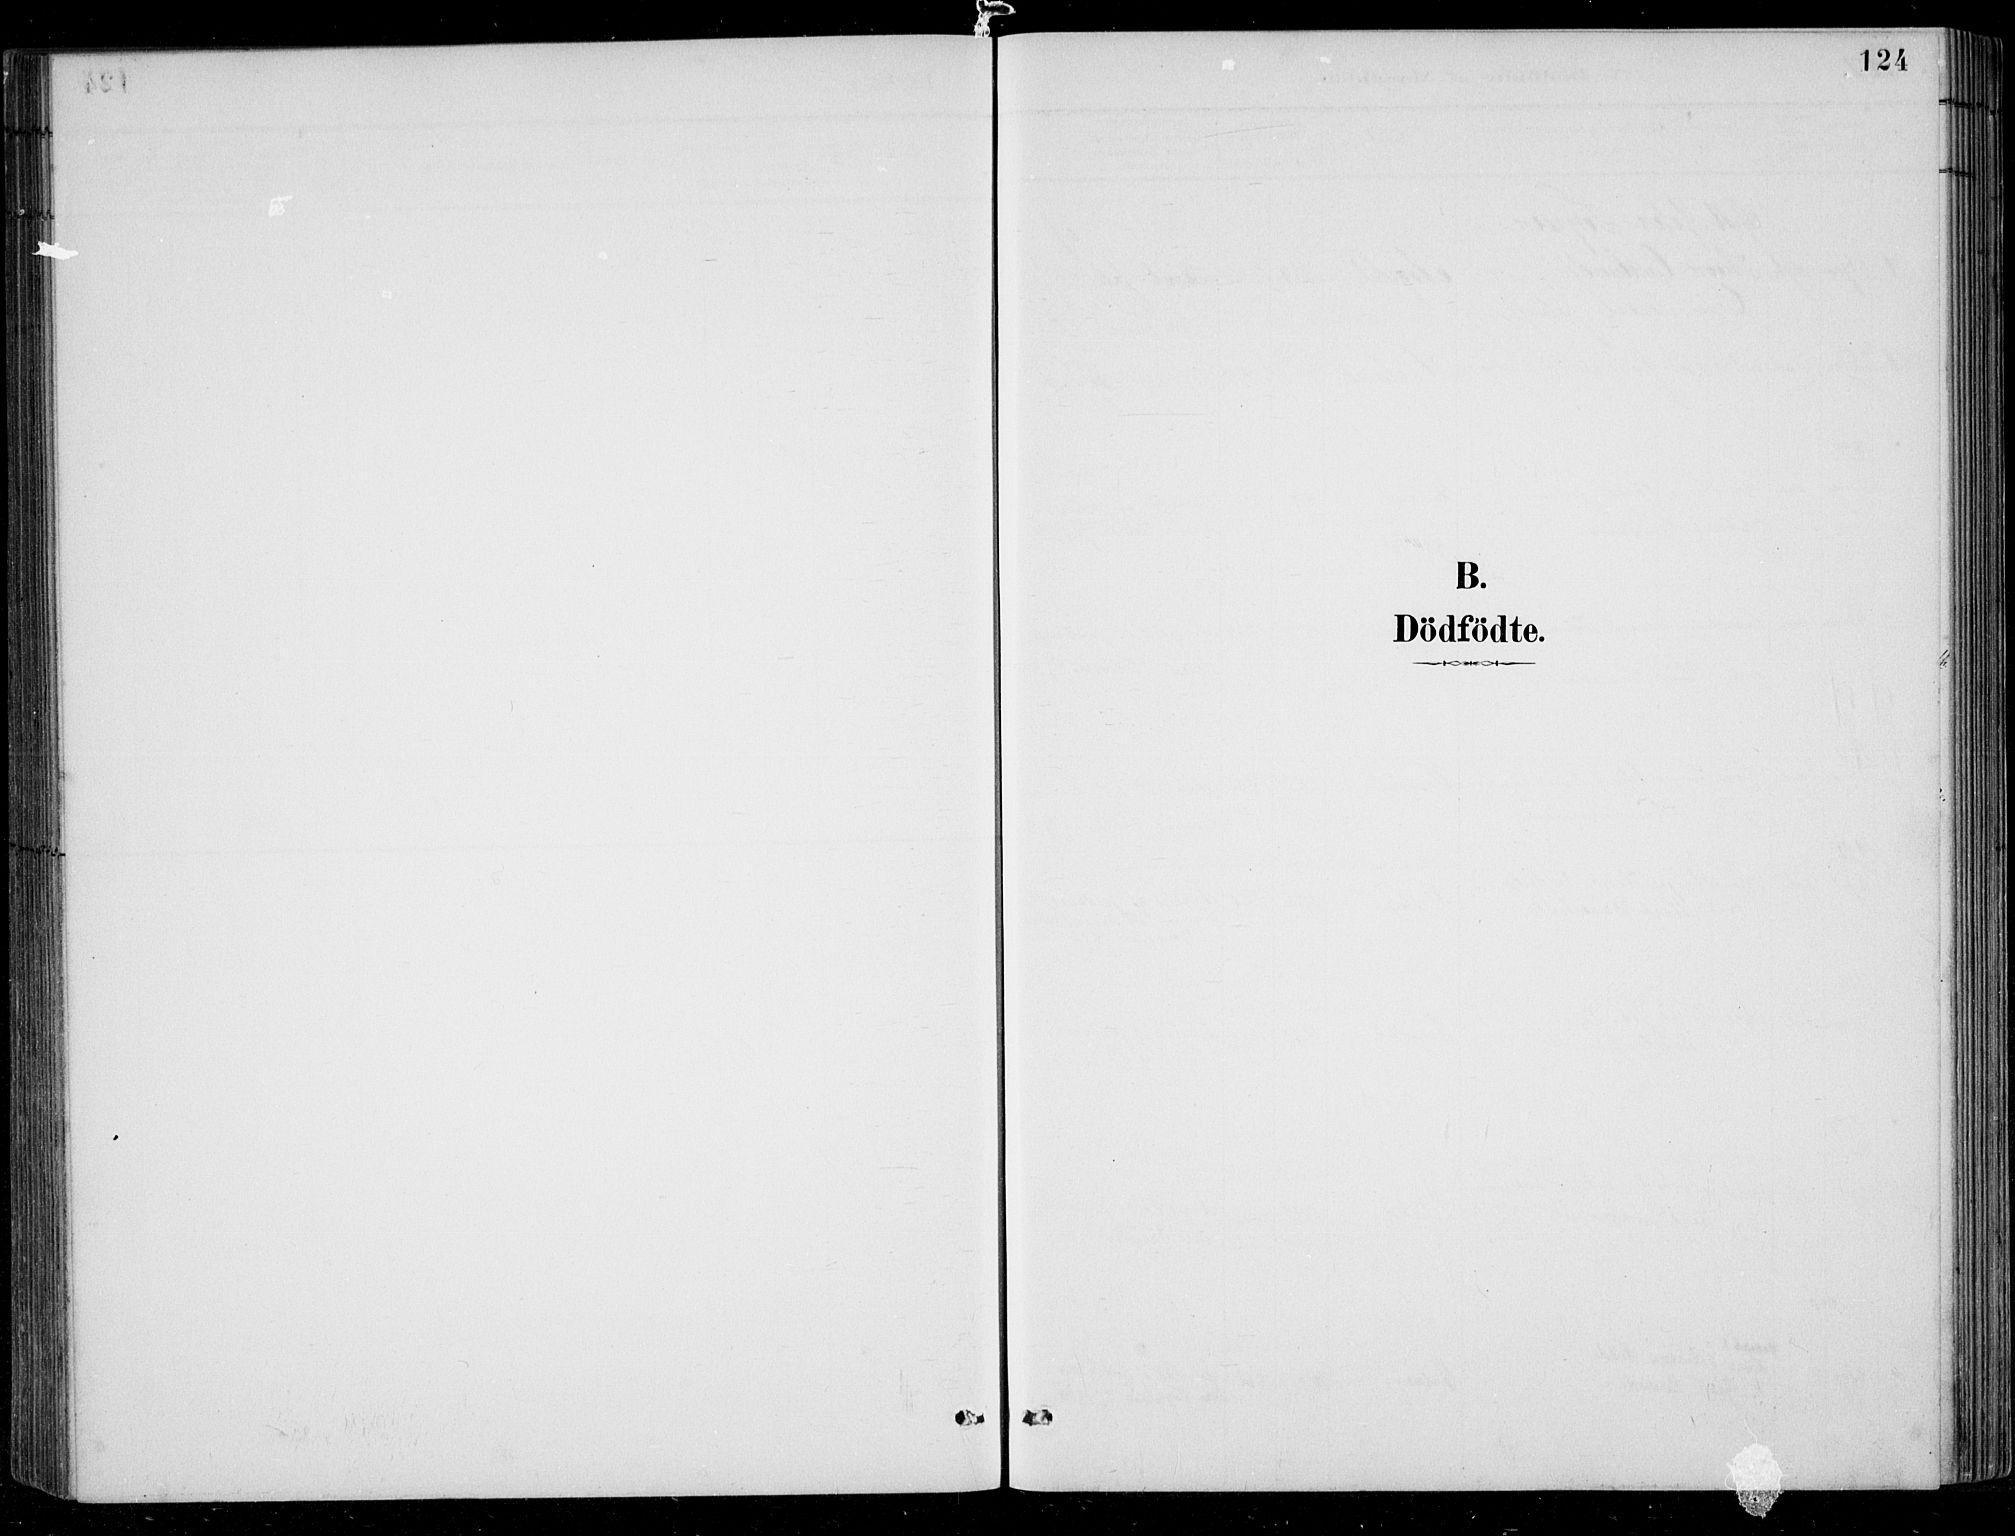 SAK, Bjelland sokneprestkontor, F/Fb/Fbc/L0003: Klokkerbok nr. B 3, 1887-1924, s. 124